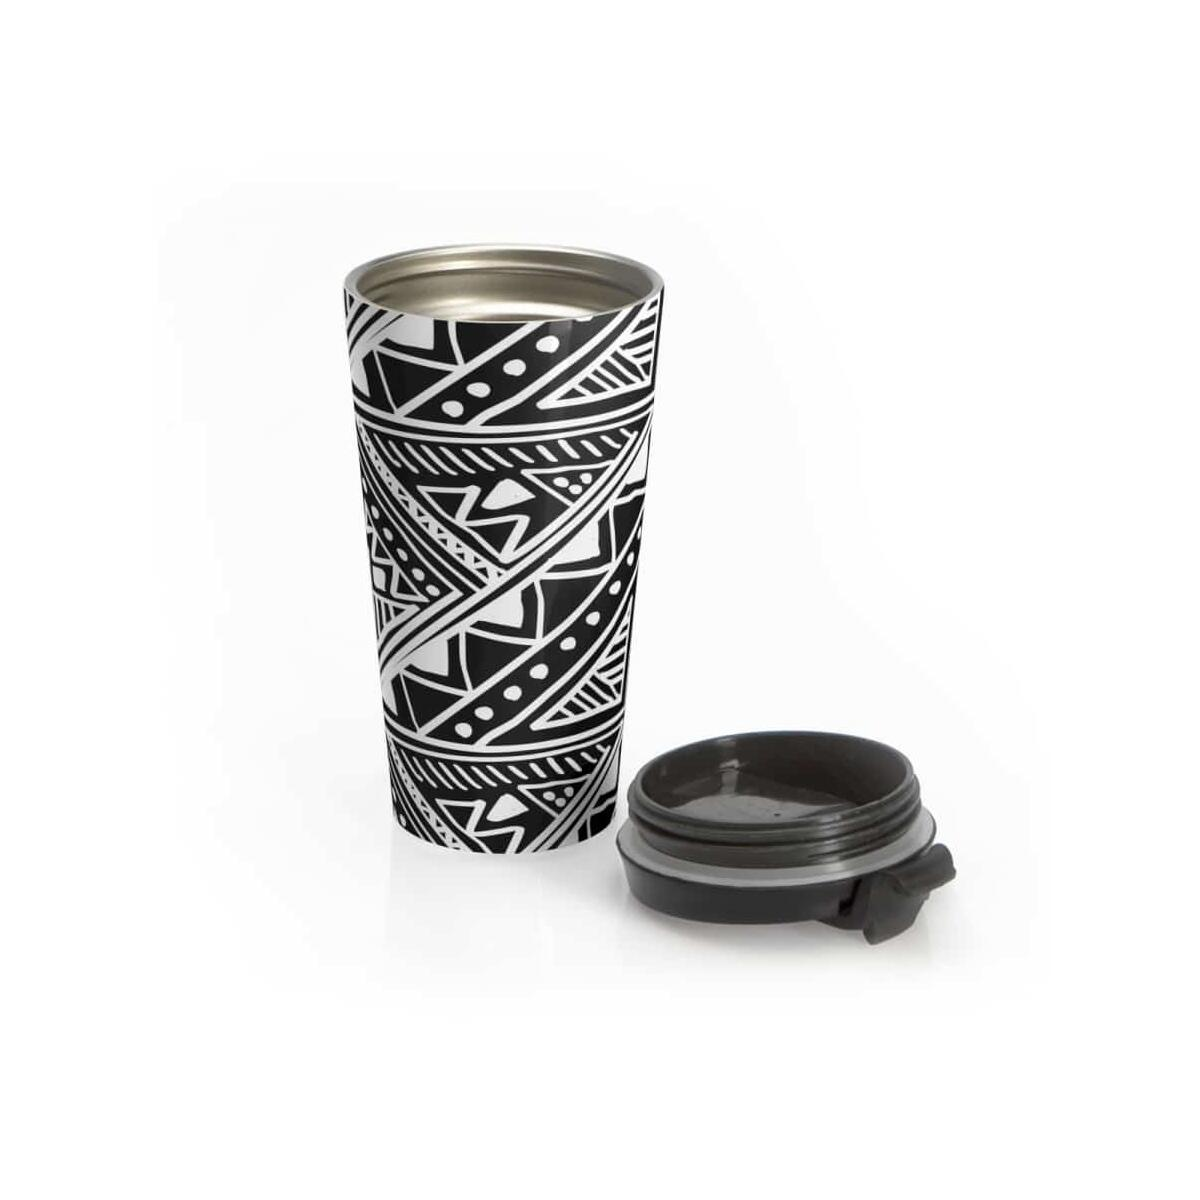 White Mud-cloth Stainless Steel Travel Mug, Travel Mug